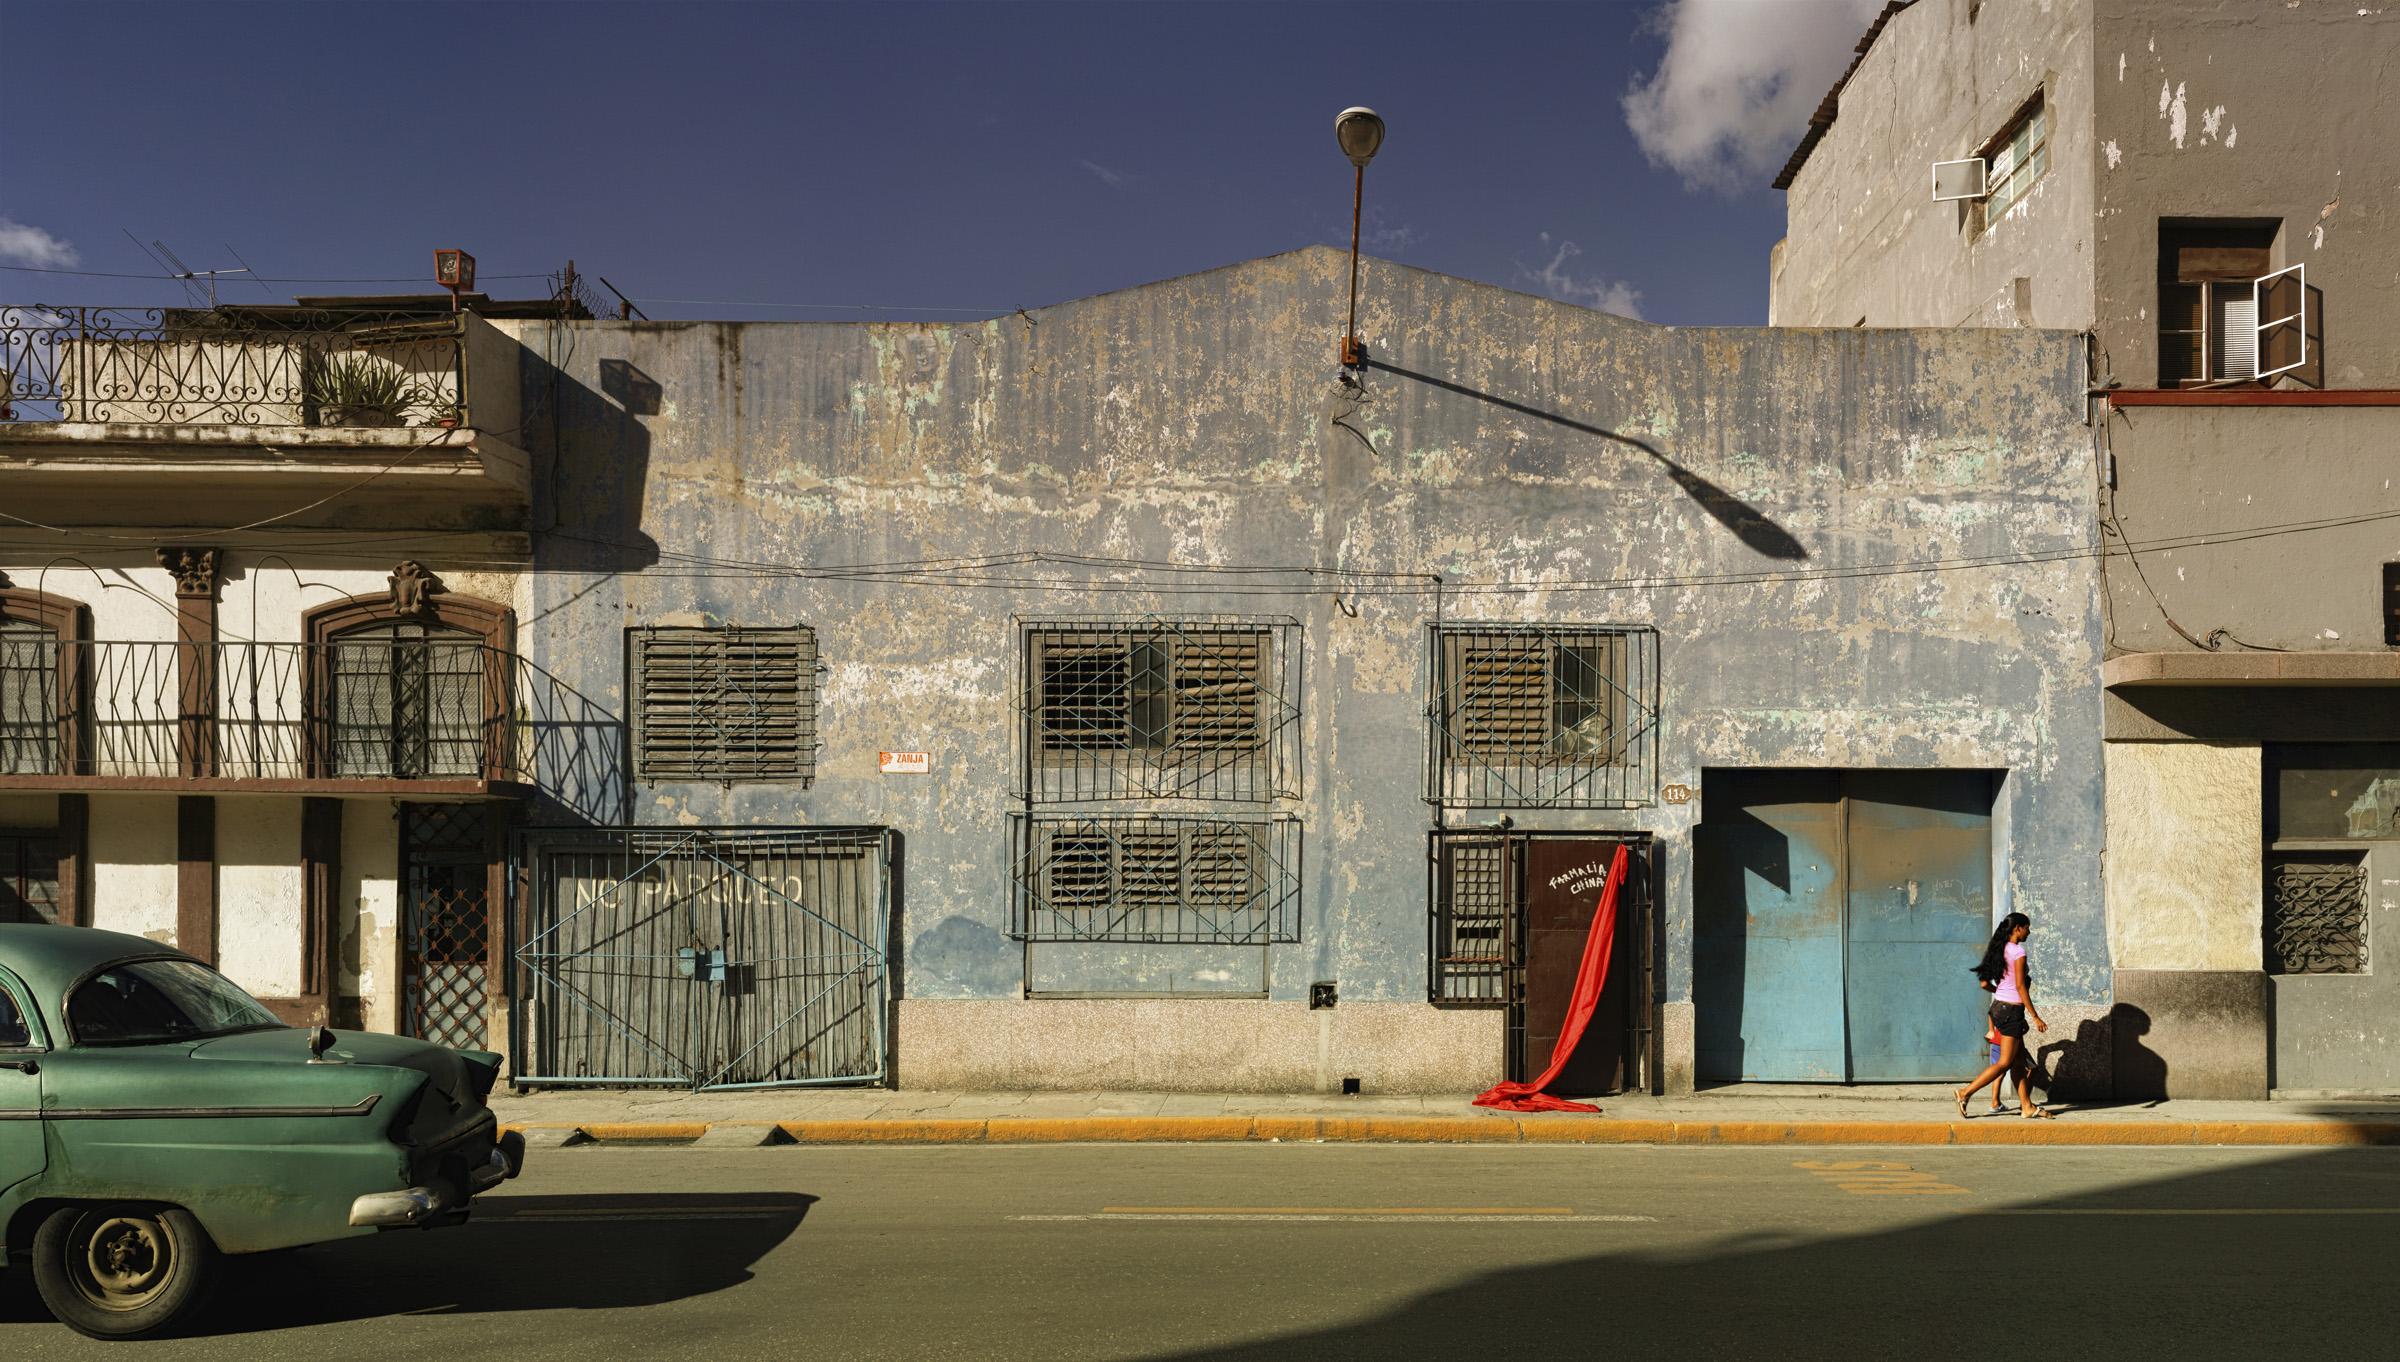 CUHA-CHZ - China y Zanja - Havana.jpg